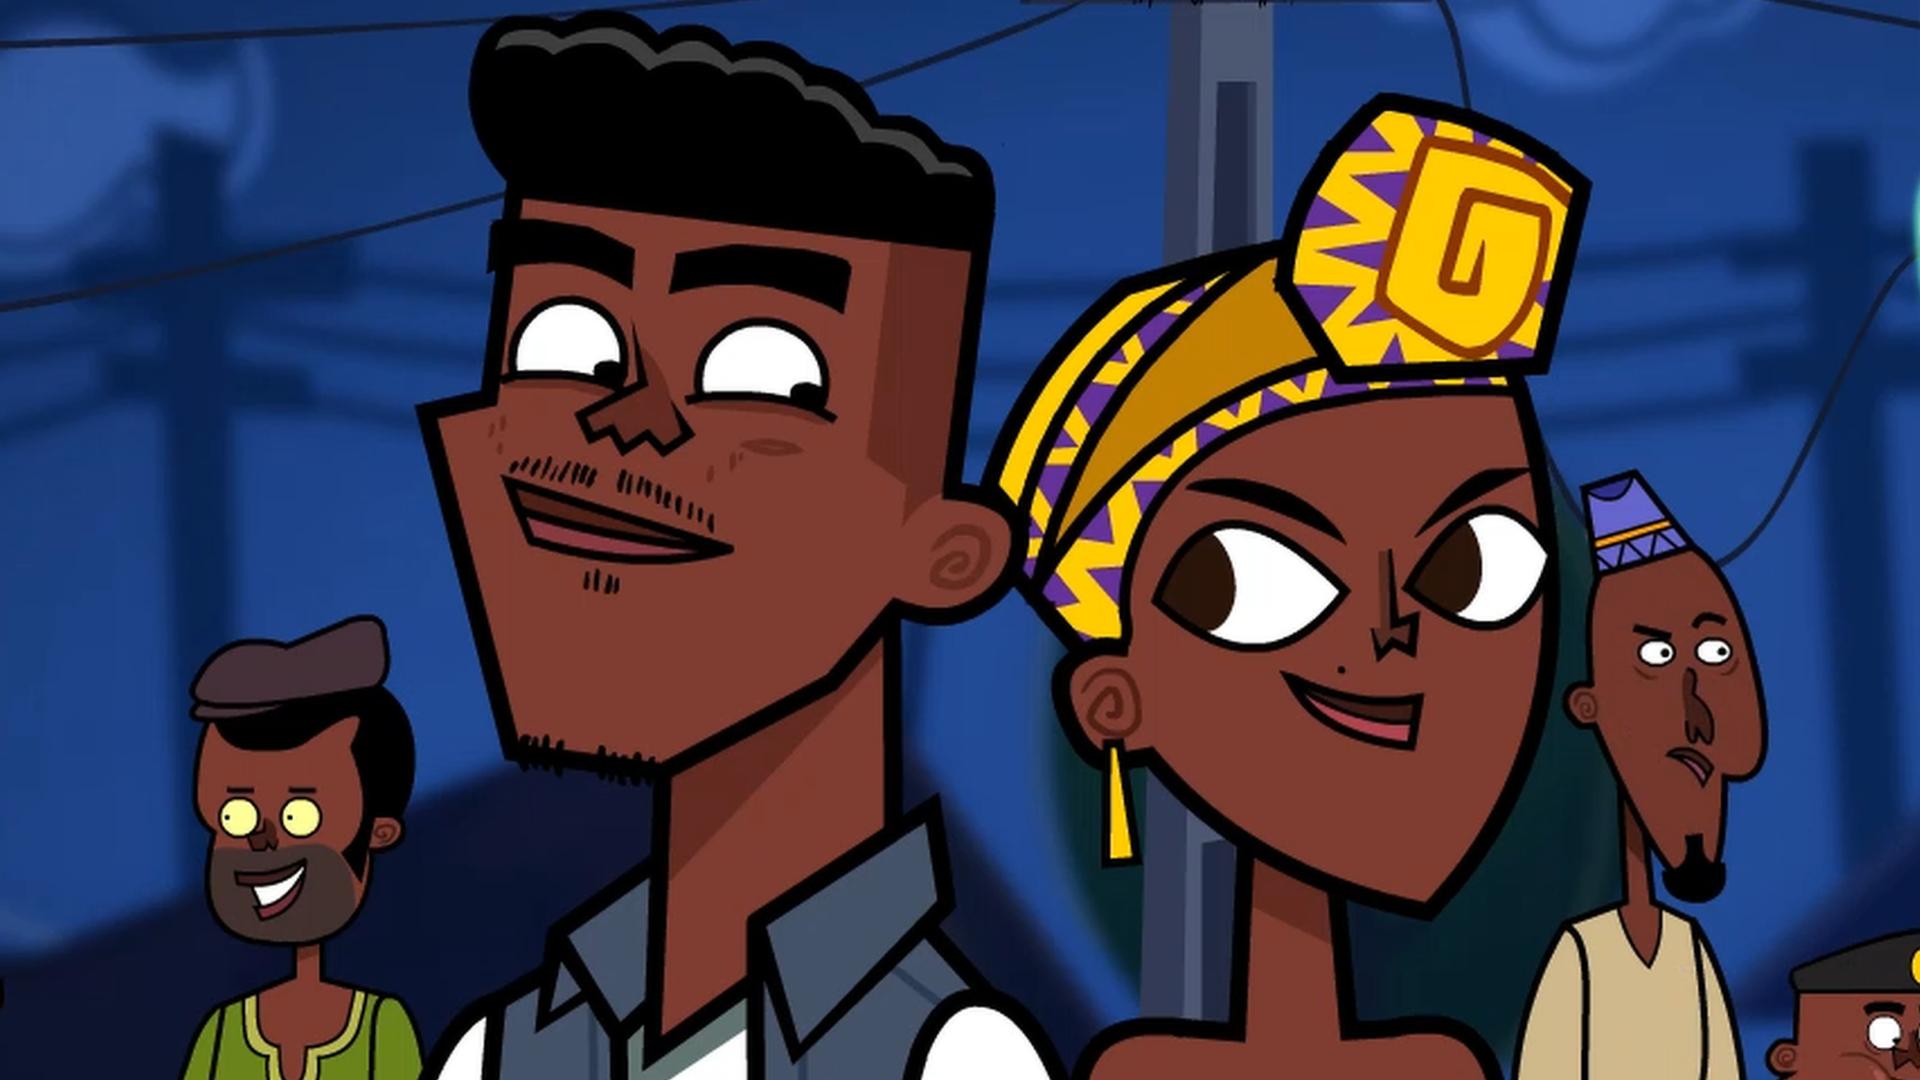 A cartoon by Nigerian animator Ridwan Moshood